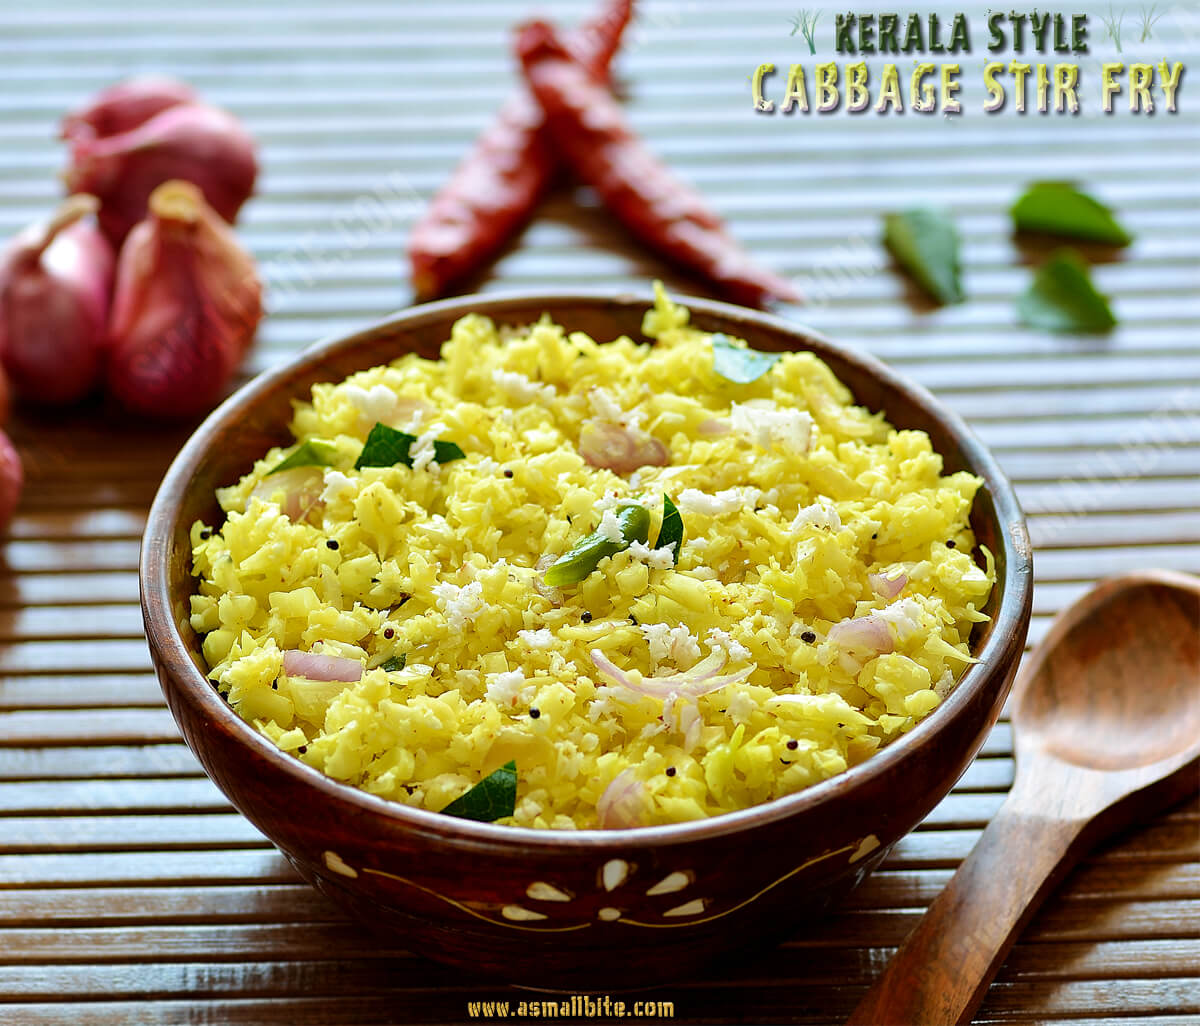 Kerala Style Cabbage Stir Fry